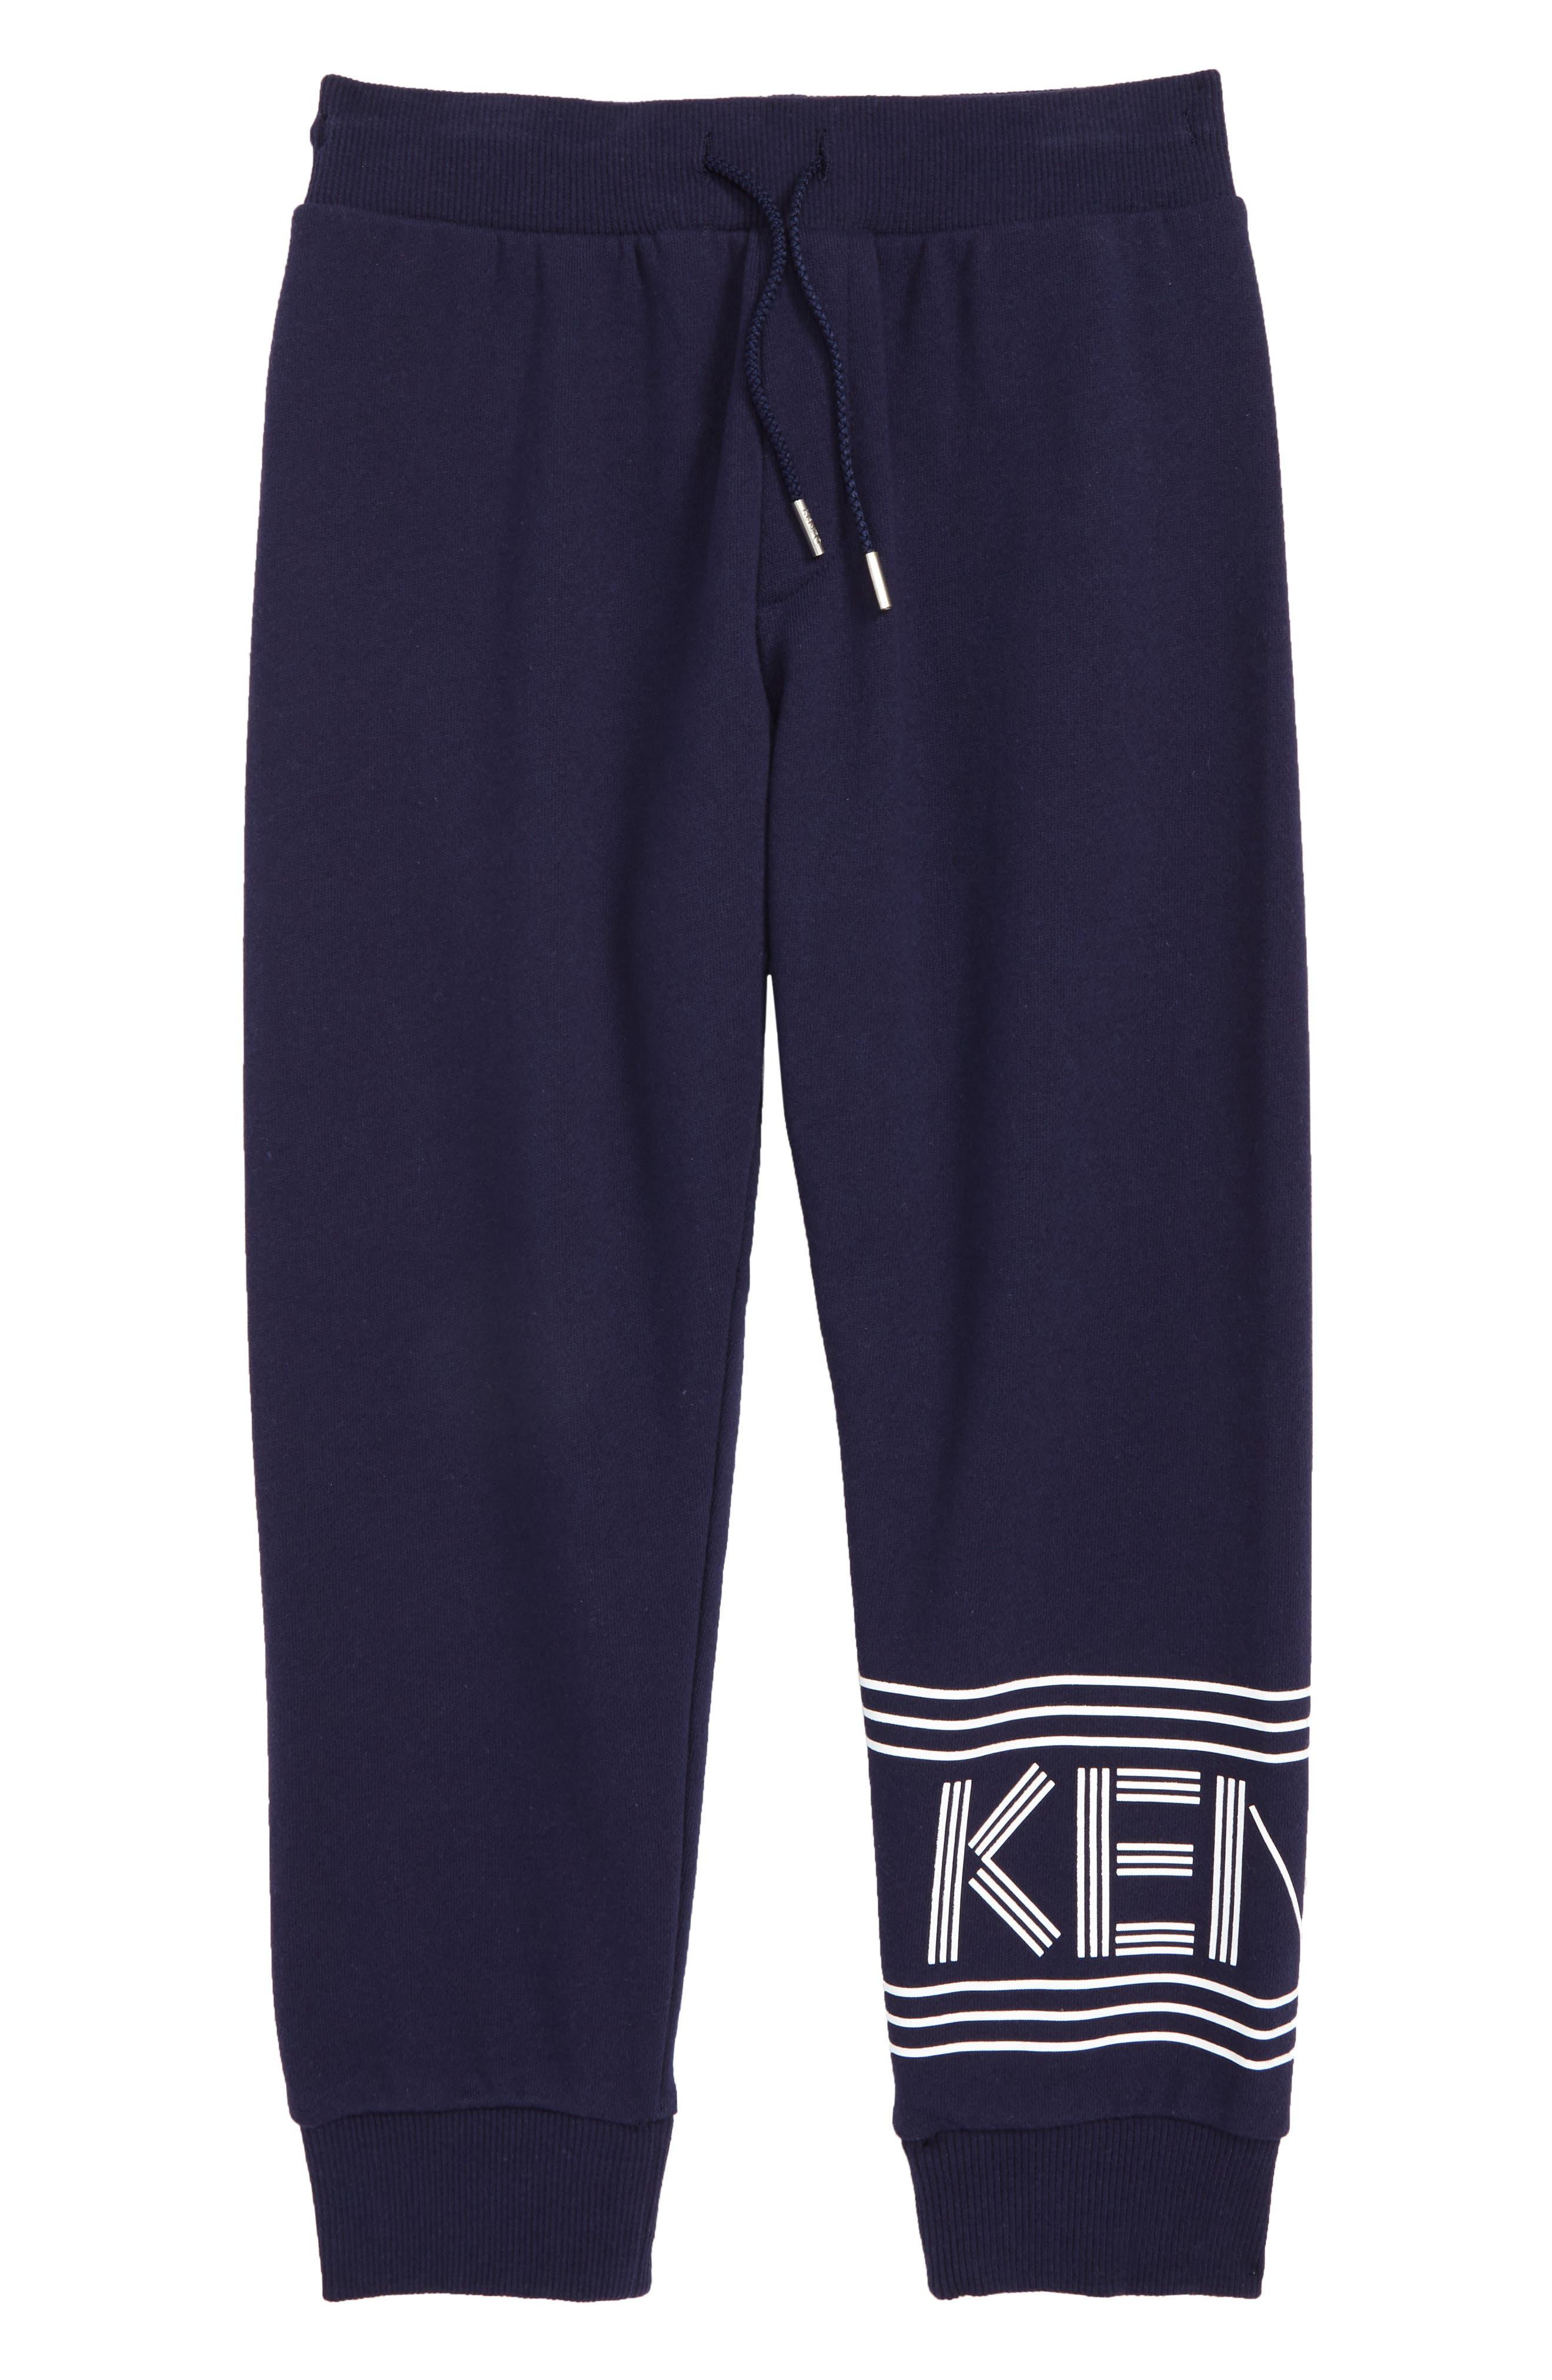 KENZO Logo Jogger Sweatpants, Main, color, NAVY